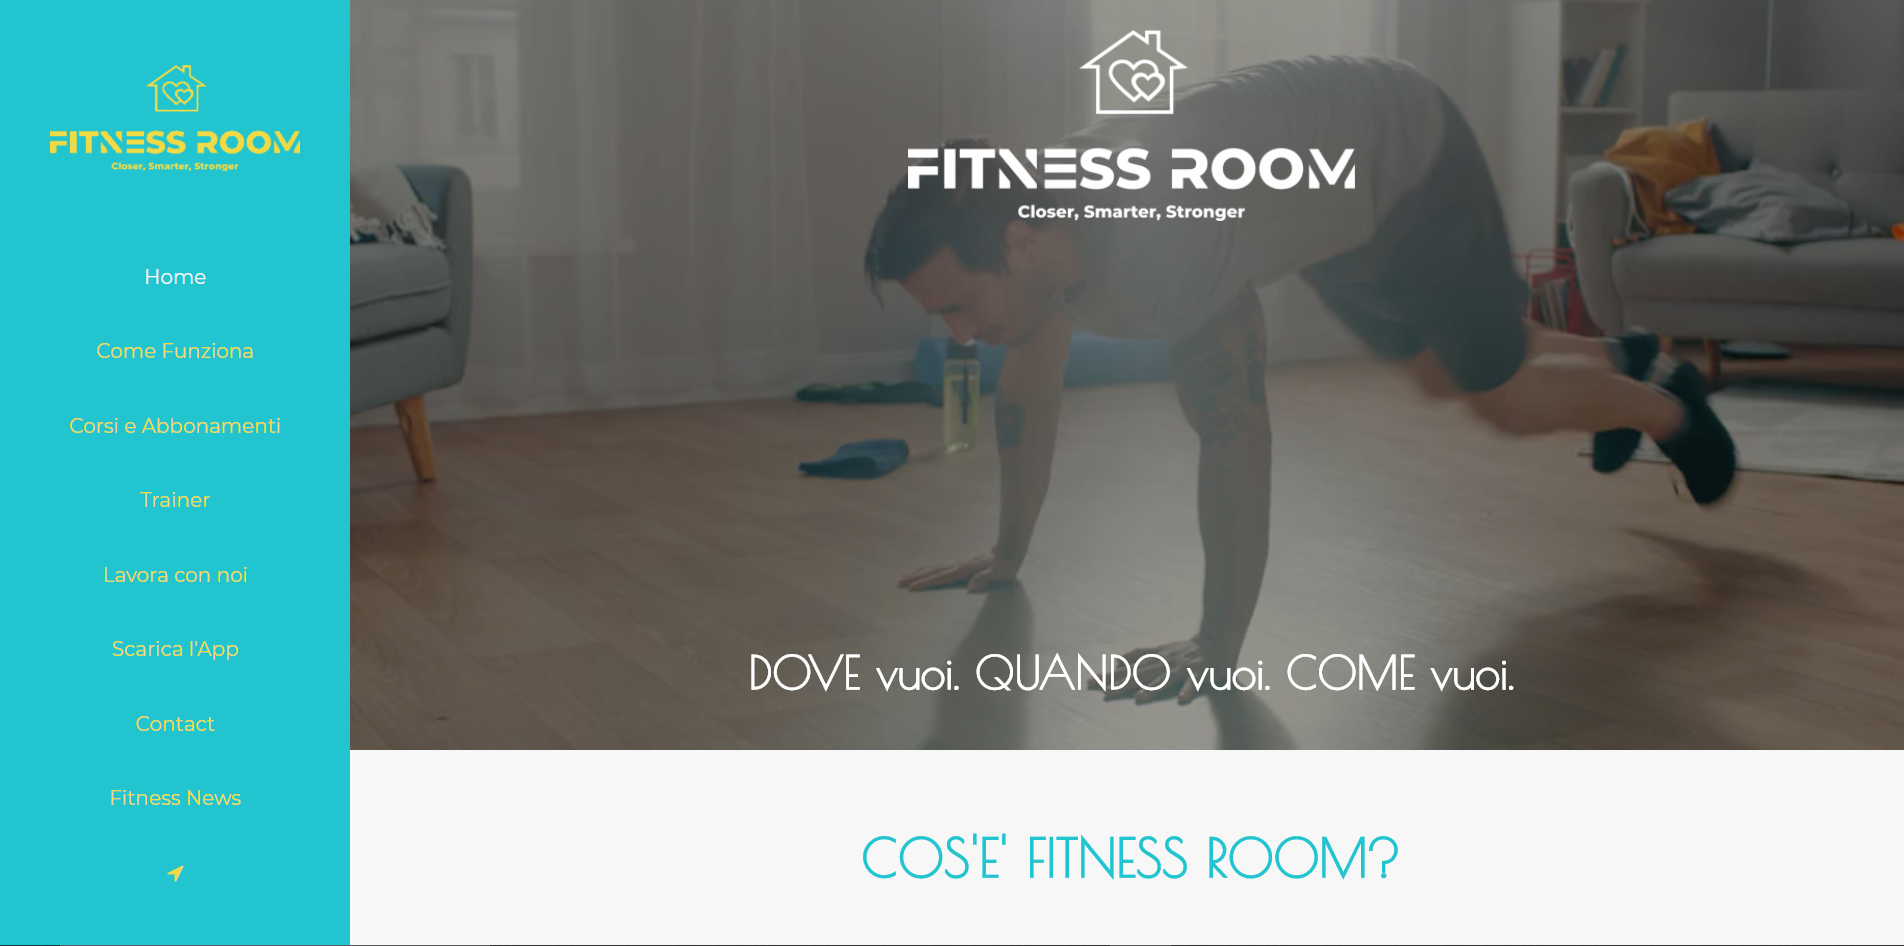 Pagine sito fitnessroom